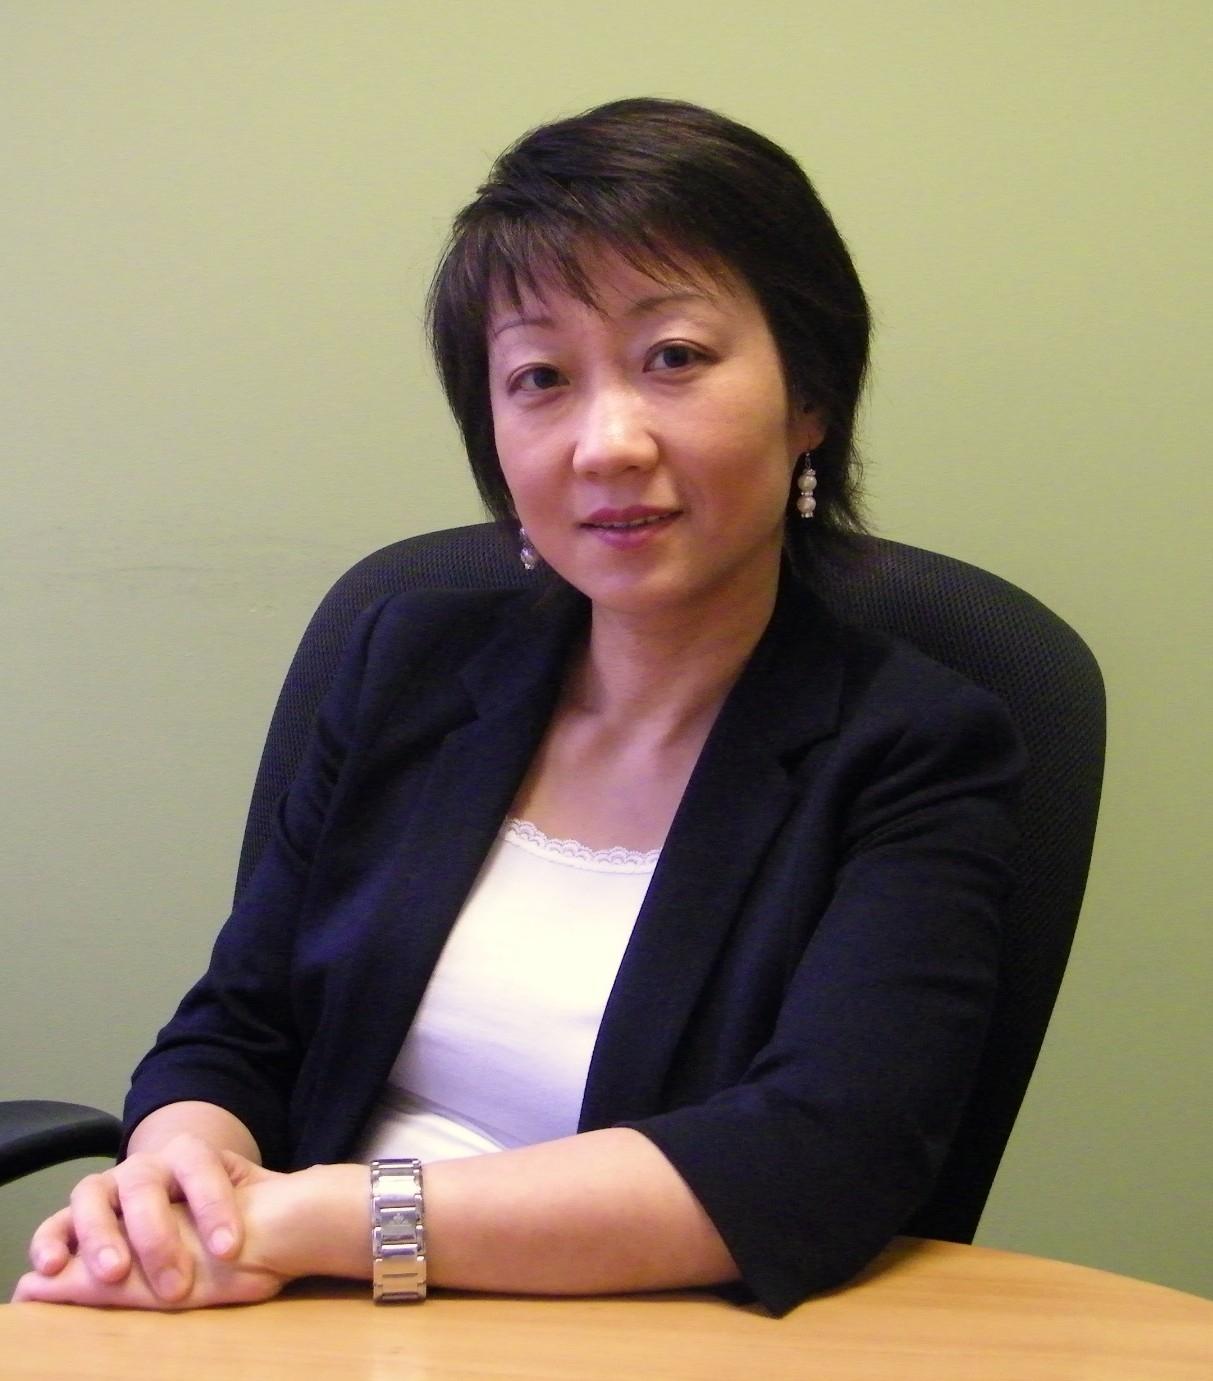 Louise Lin